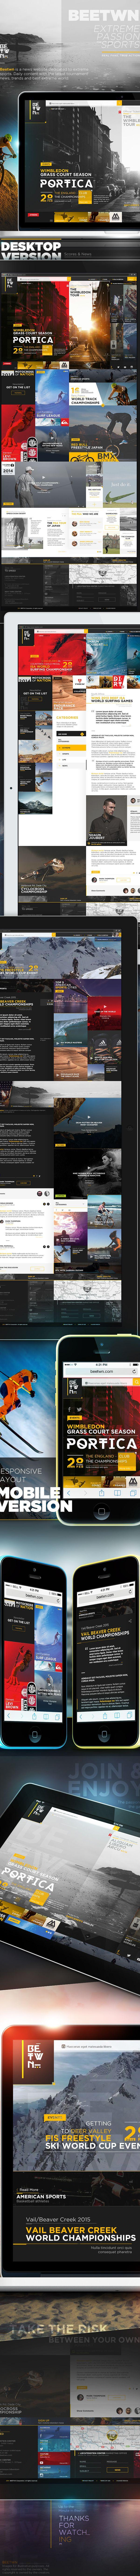 pinterest.com/fra411 #webdesign - BEETWN - Extreme Sports Magazine Concept by Josué Solano, via Behance